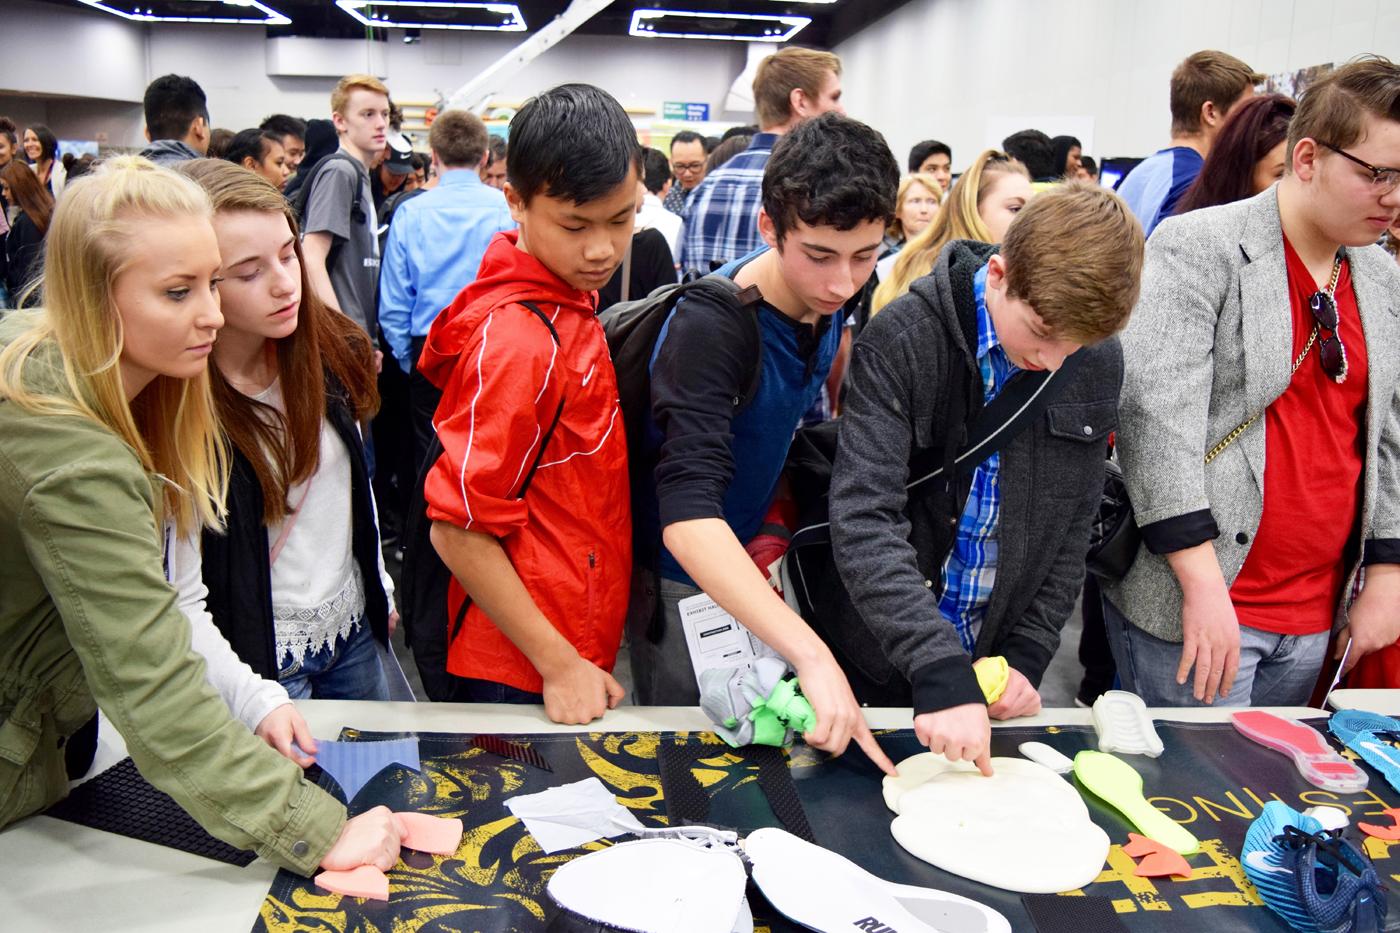 NW Youth Careers Expo 2016: Nike exhibit